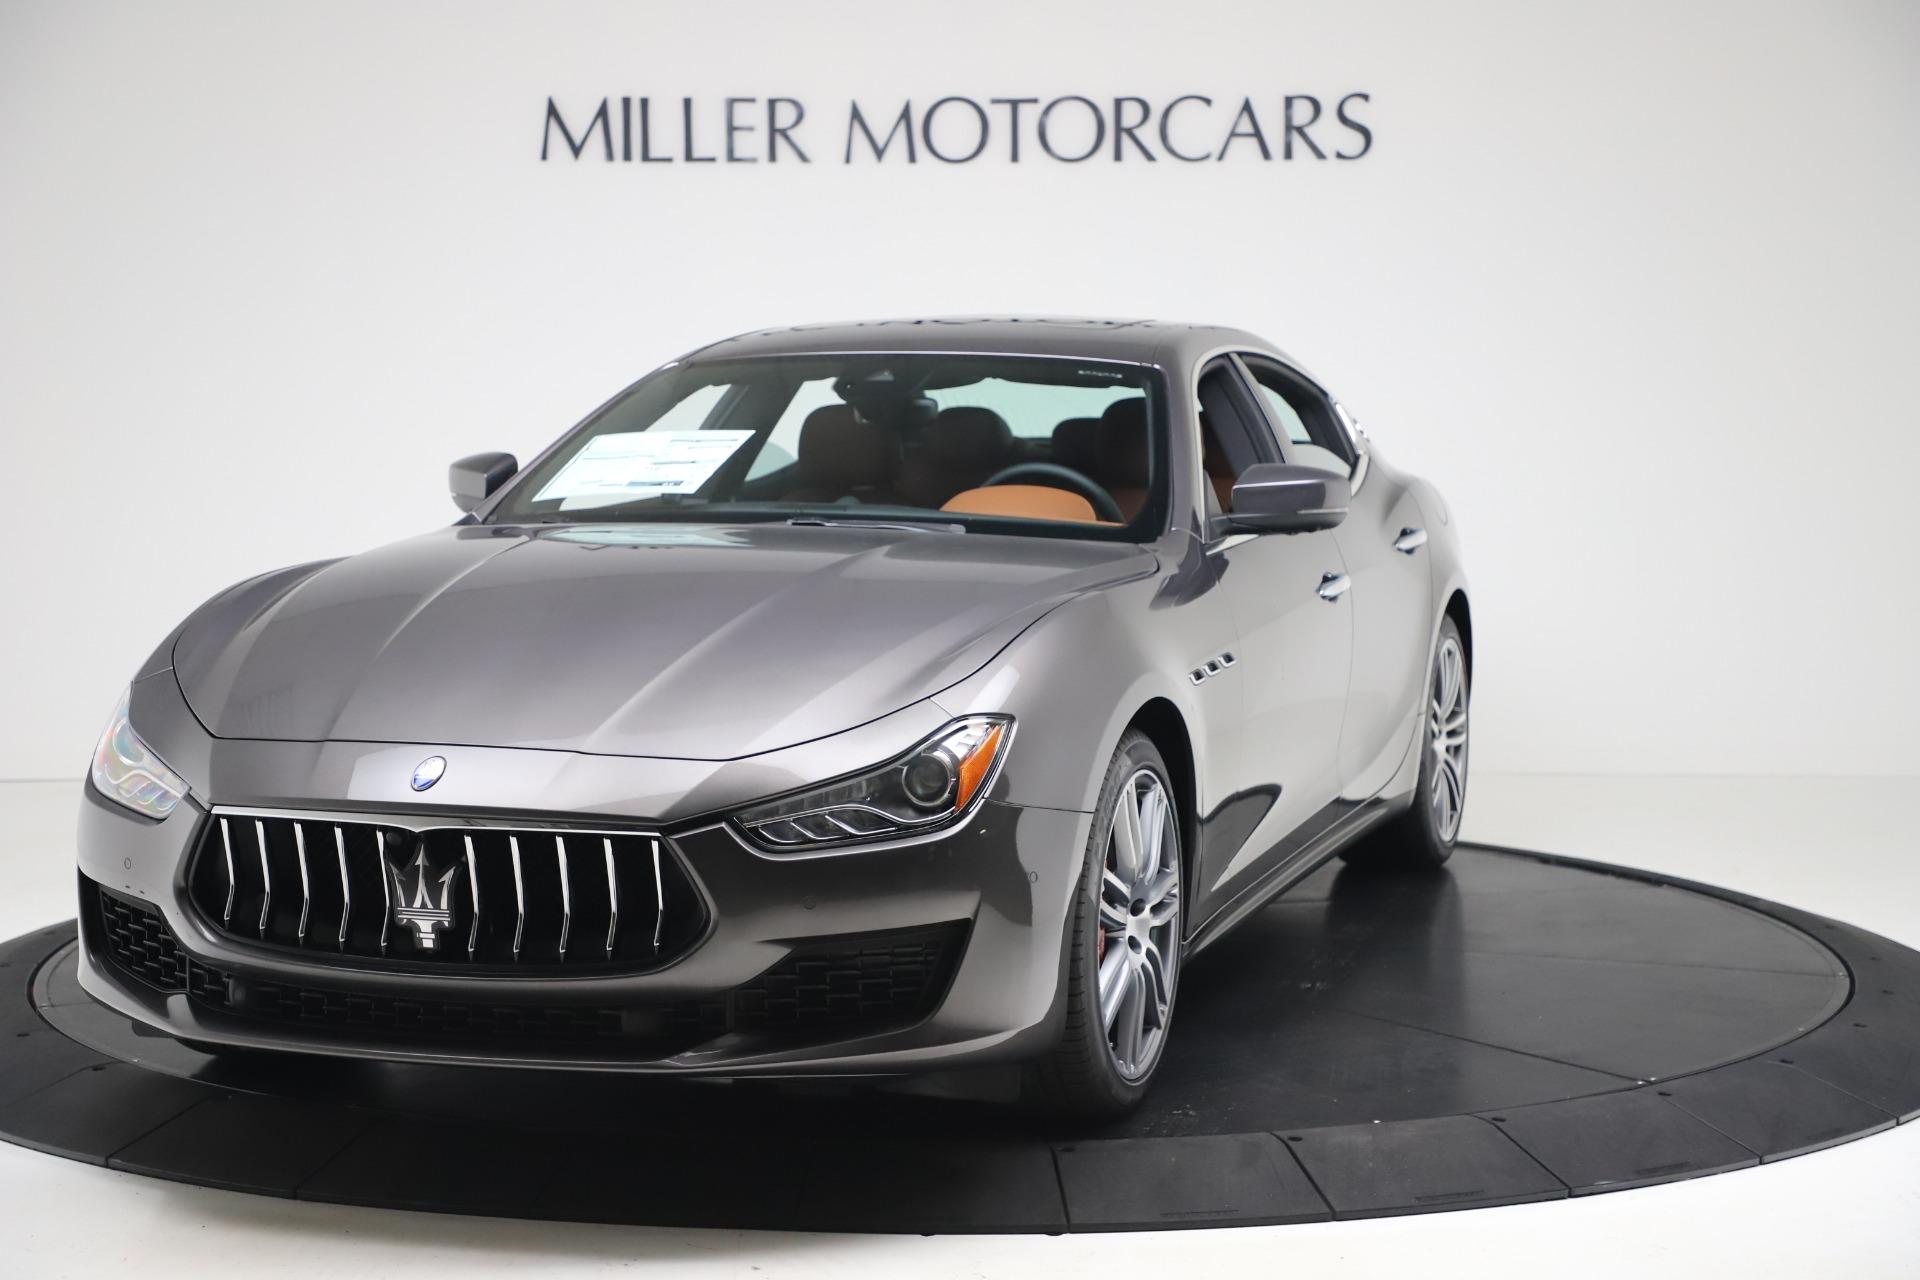 New 2020 Maserati Ghibli S Q4 for sale $87,285 at Rolls-Royce Motor Cars Greenwich in Greenwich CT 06830 1